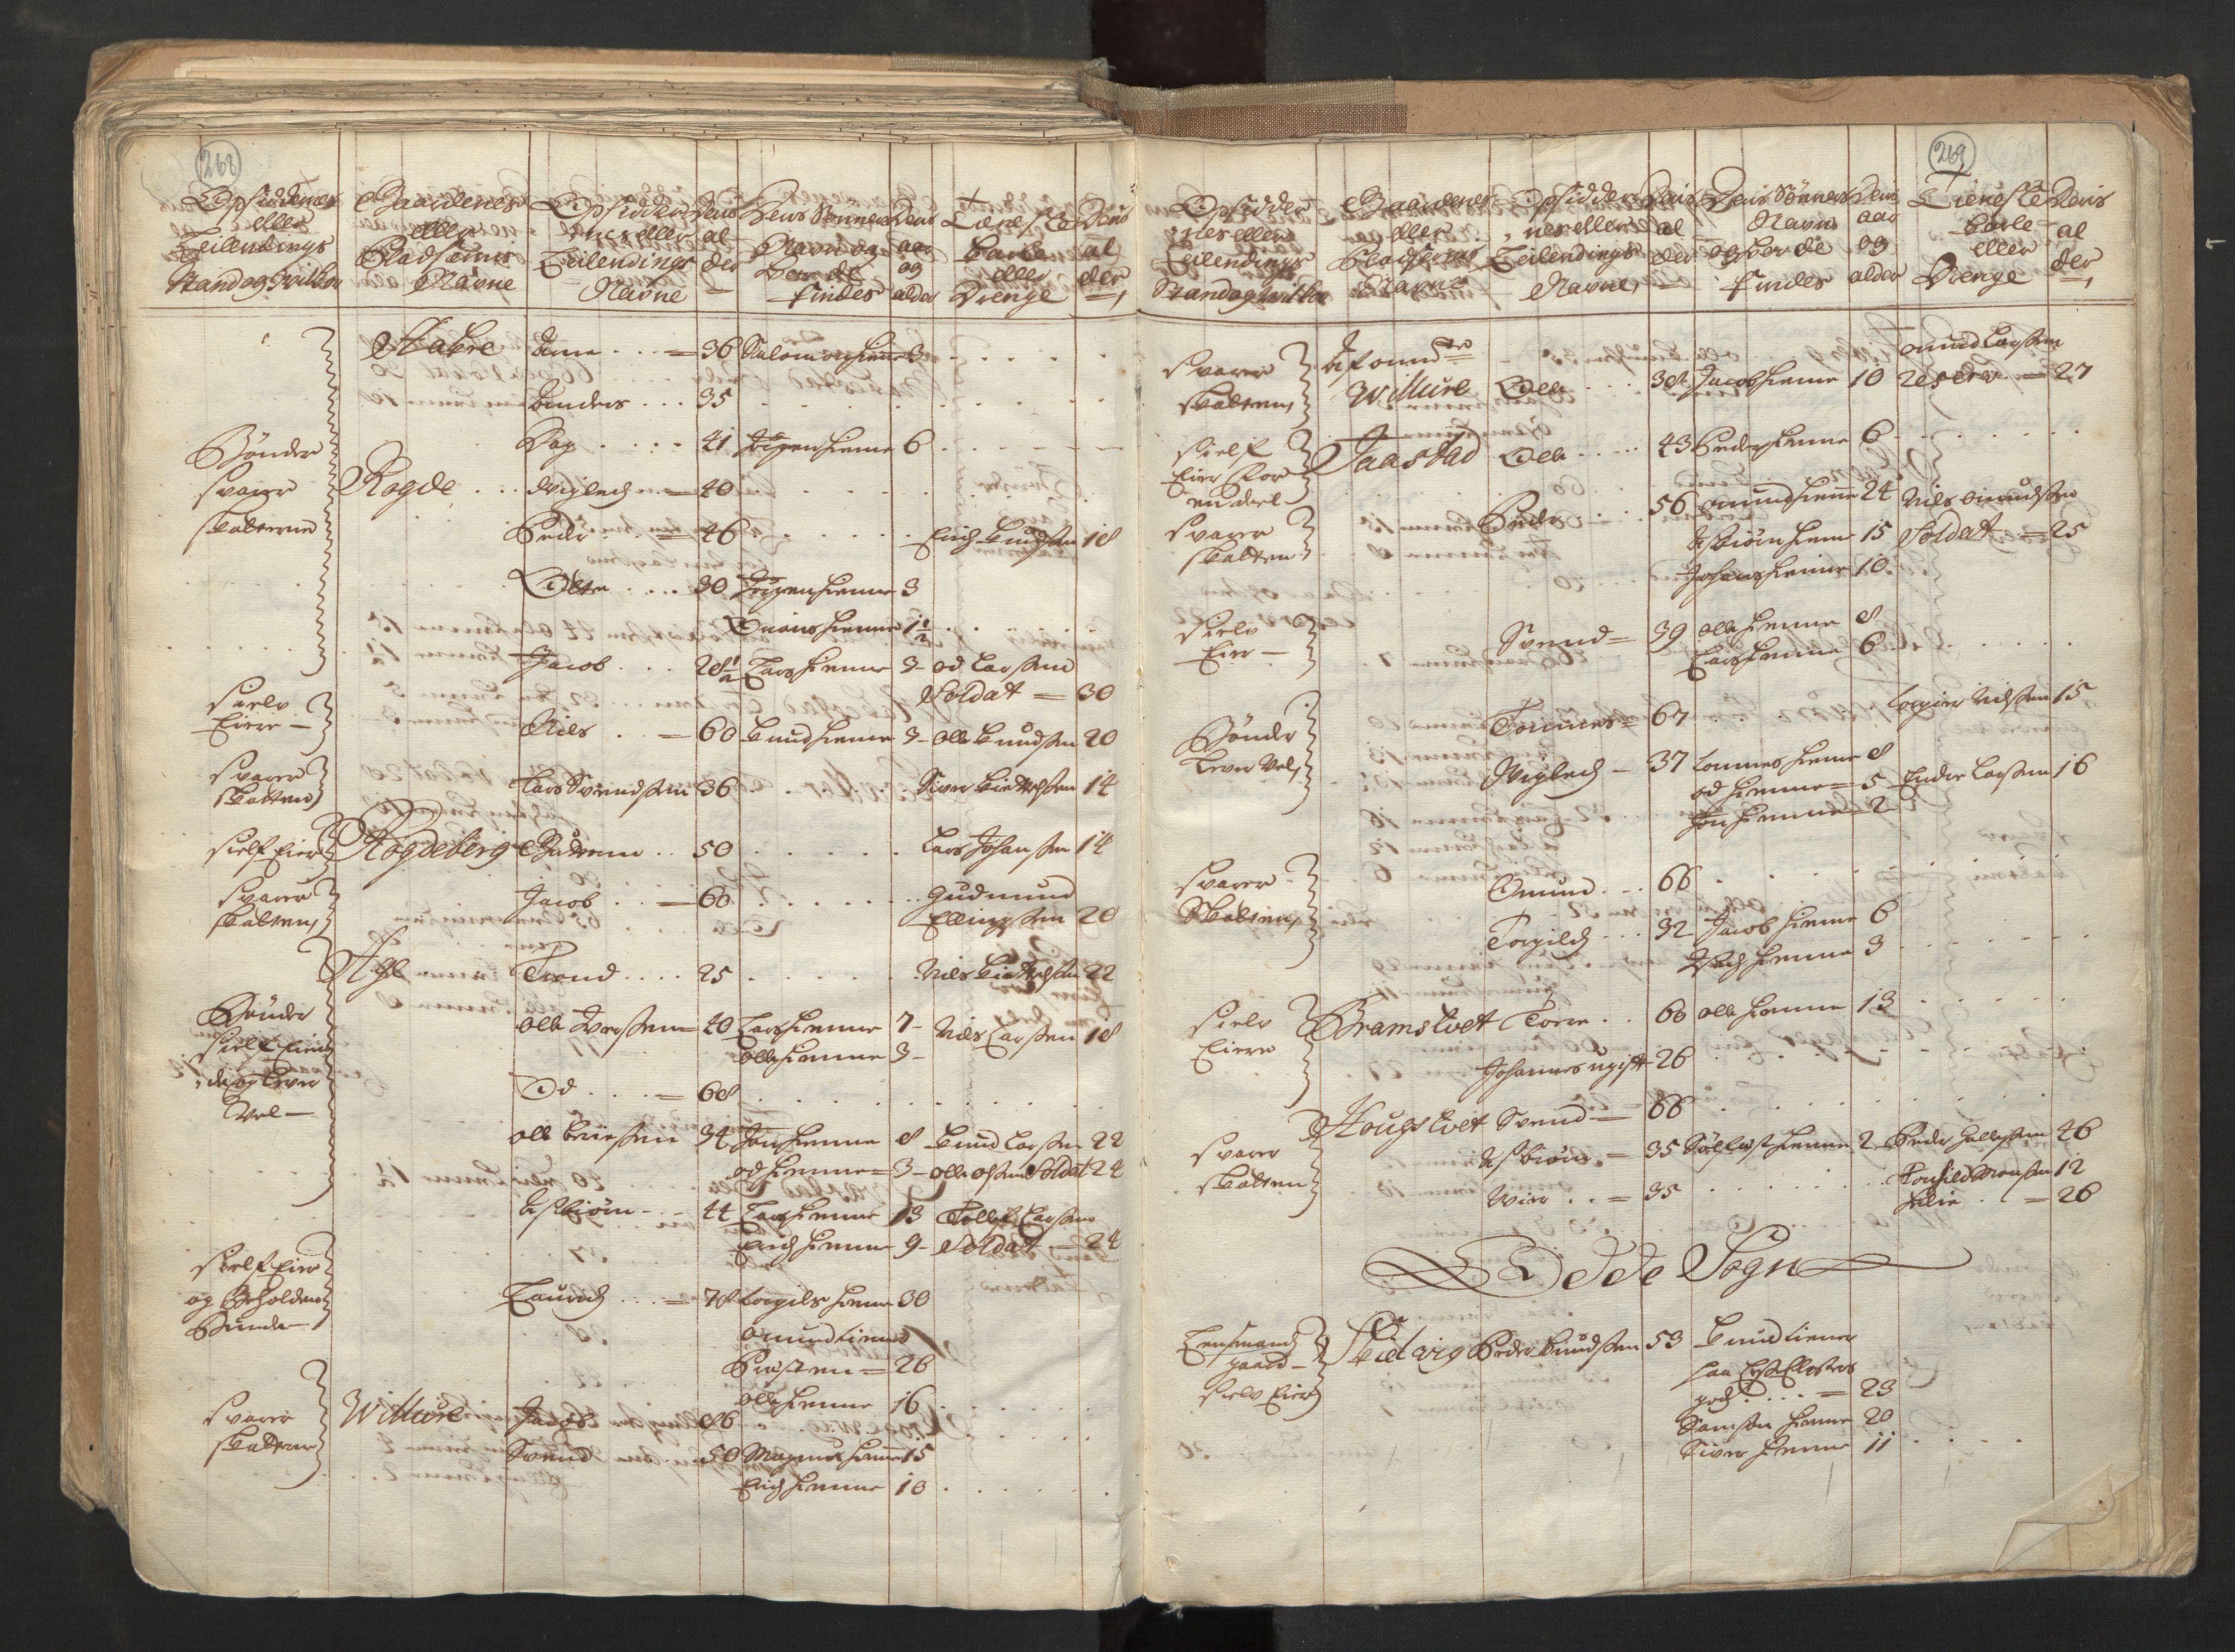 RA, Manntallet 1701, nr. 6: Sunnhordland fogderi og Hardanger fogderi, 1701, s. 268-269